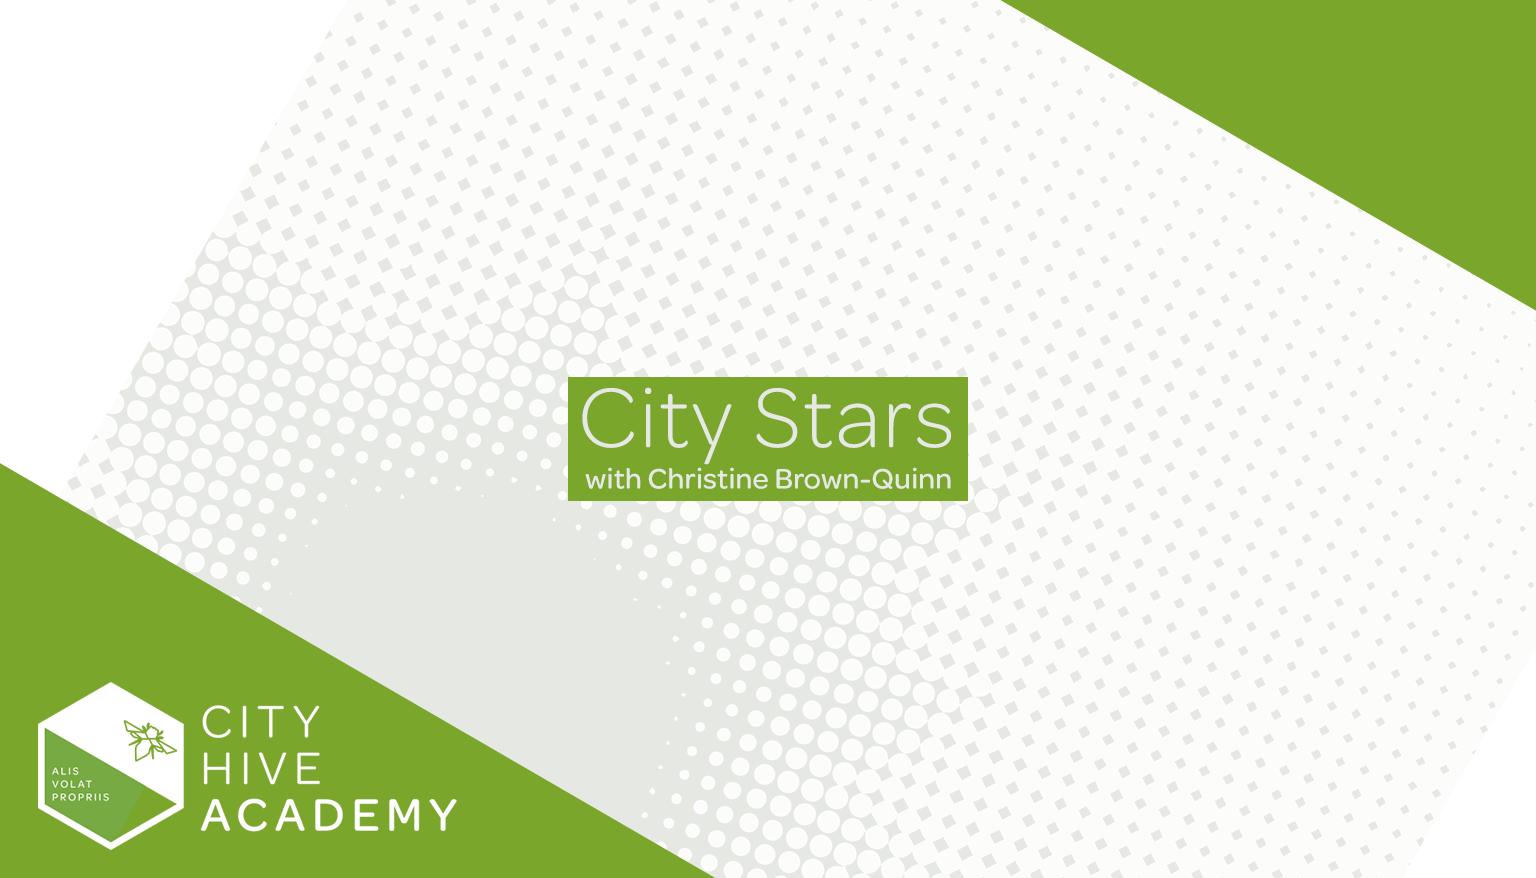 City Stars - Handle challenging conversations